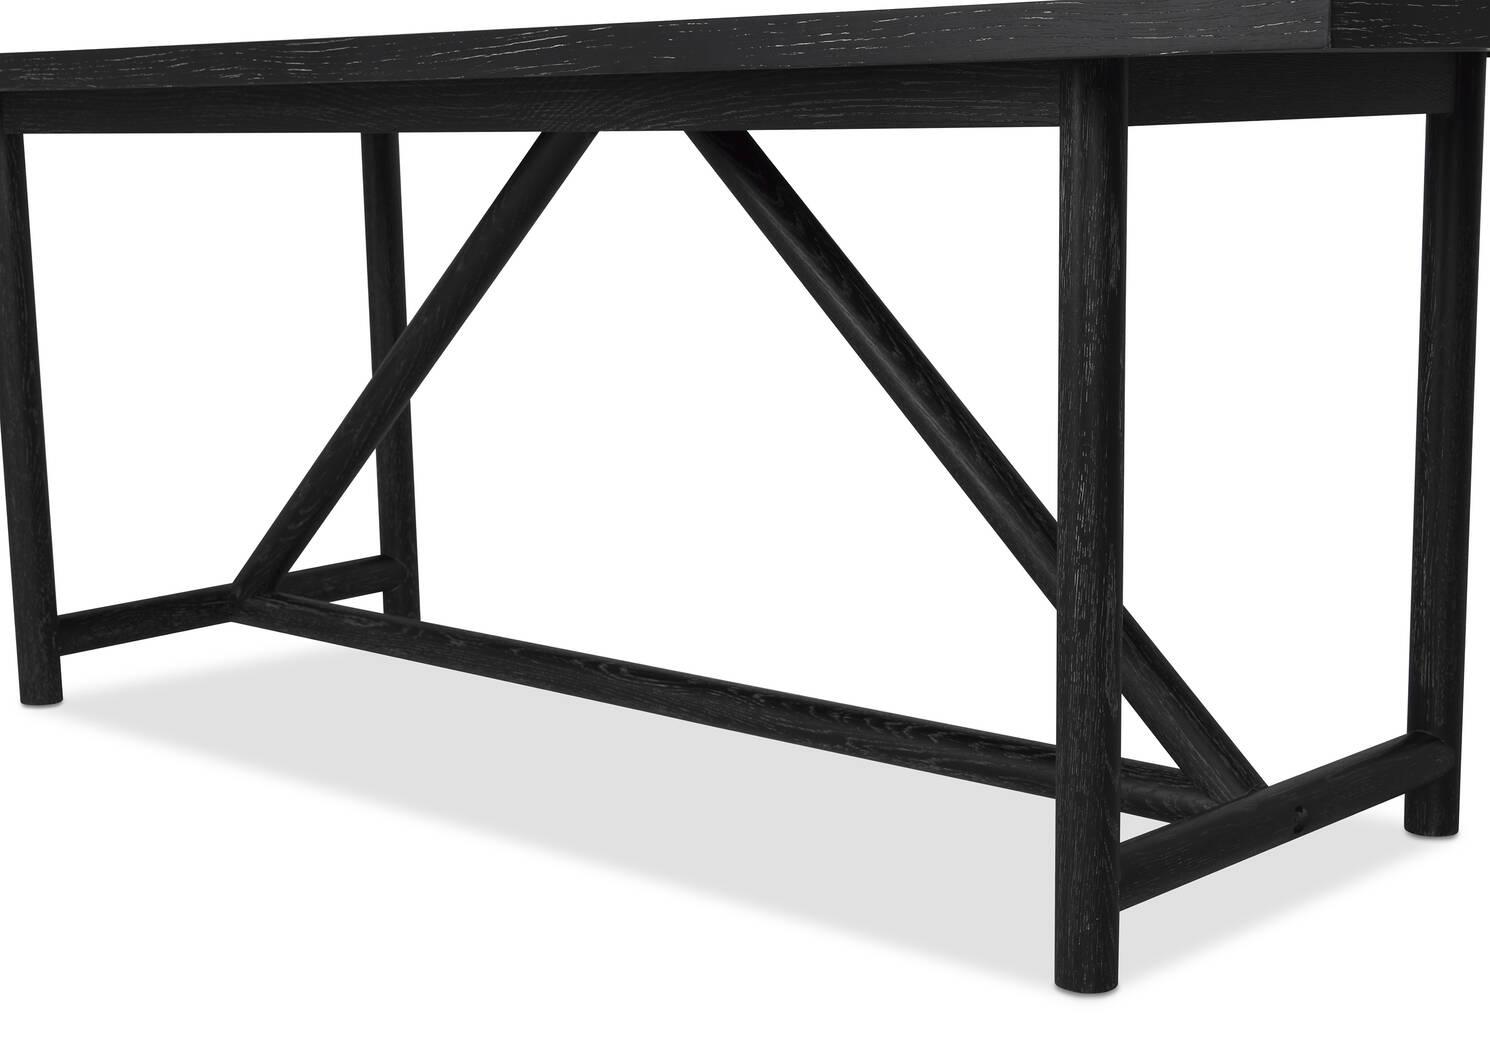 Alexi Dining Table -Acadia Coal